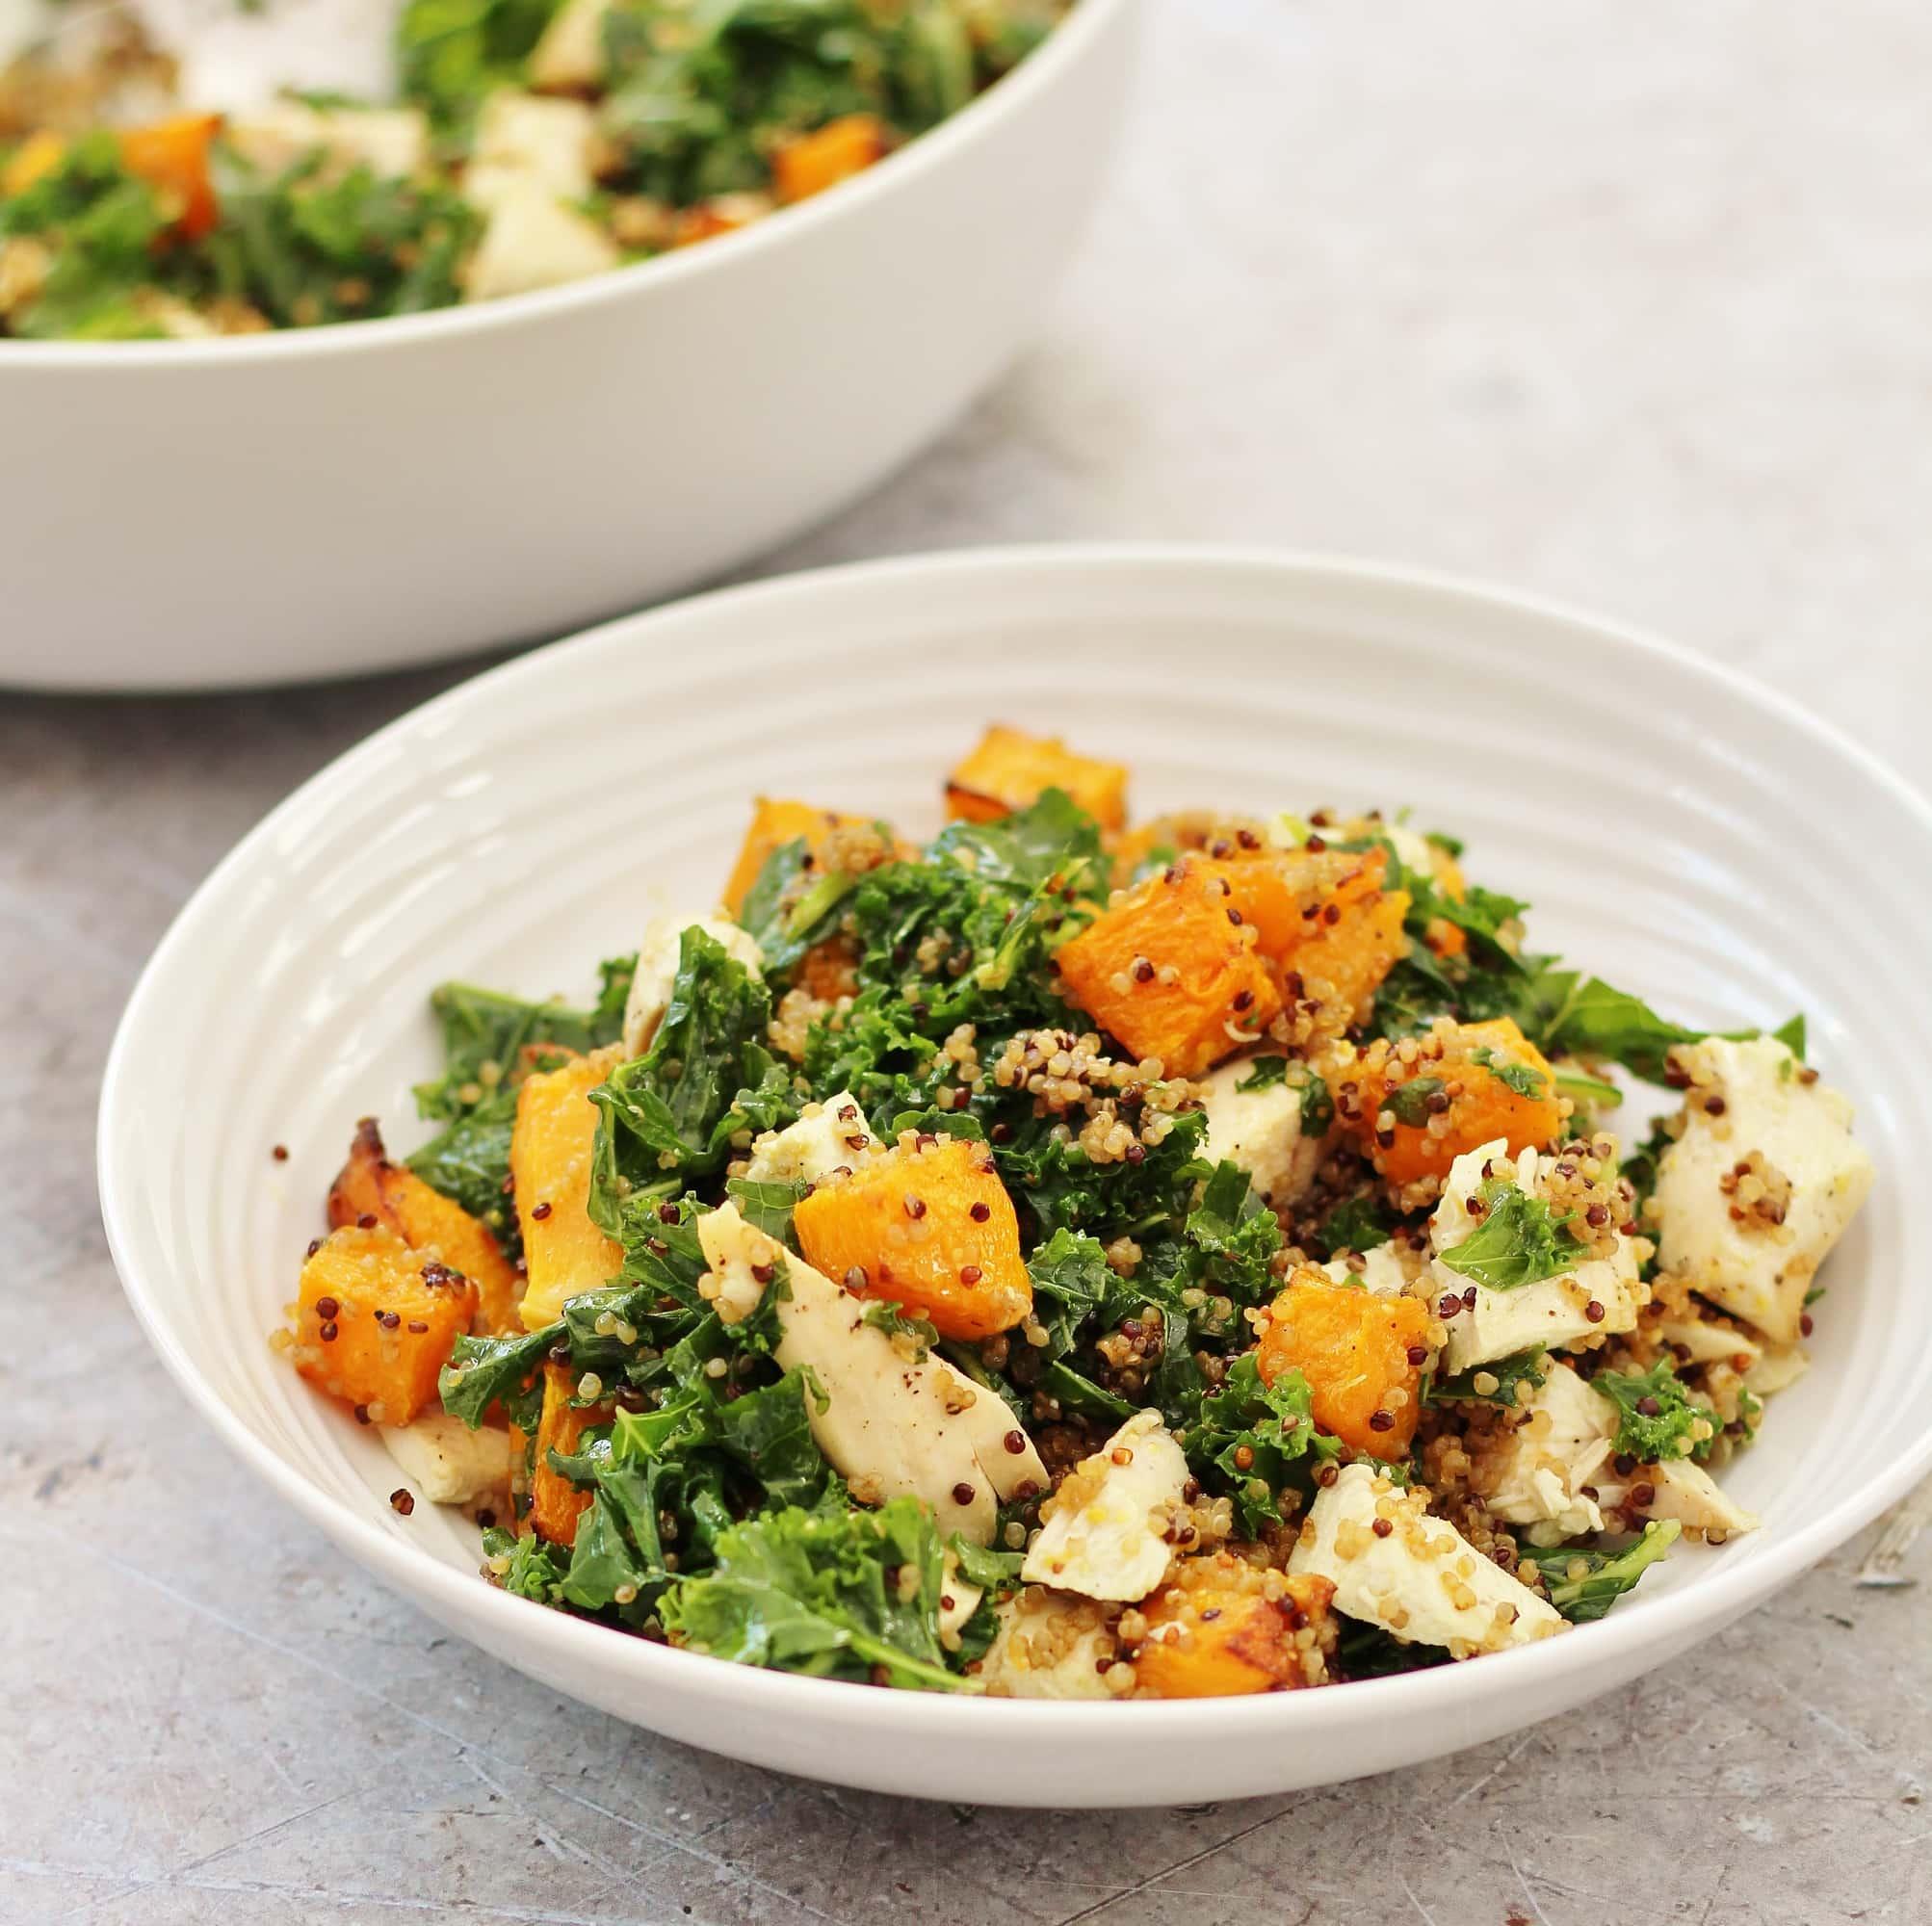 Leftover Chicken, Kale, Quinoa and Pumpkin Salad